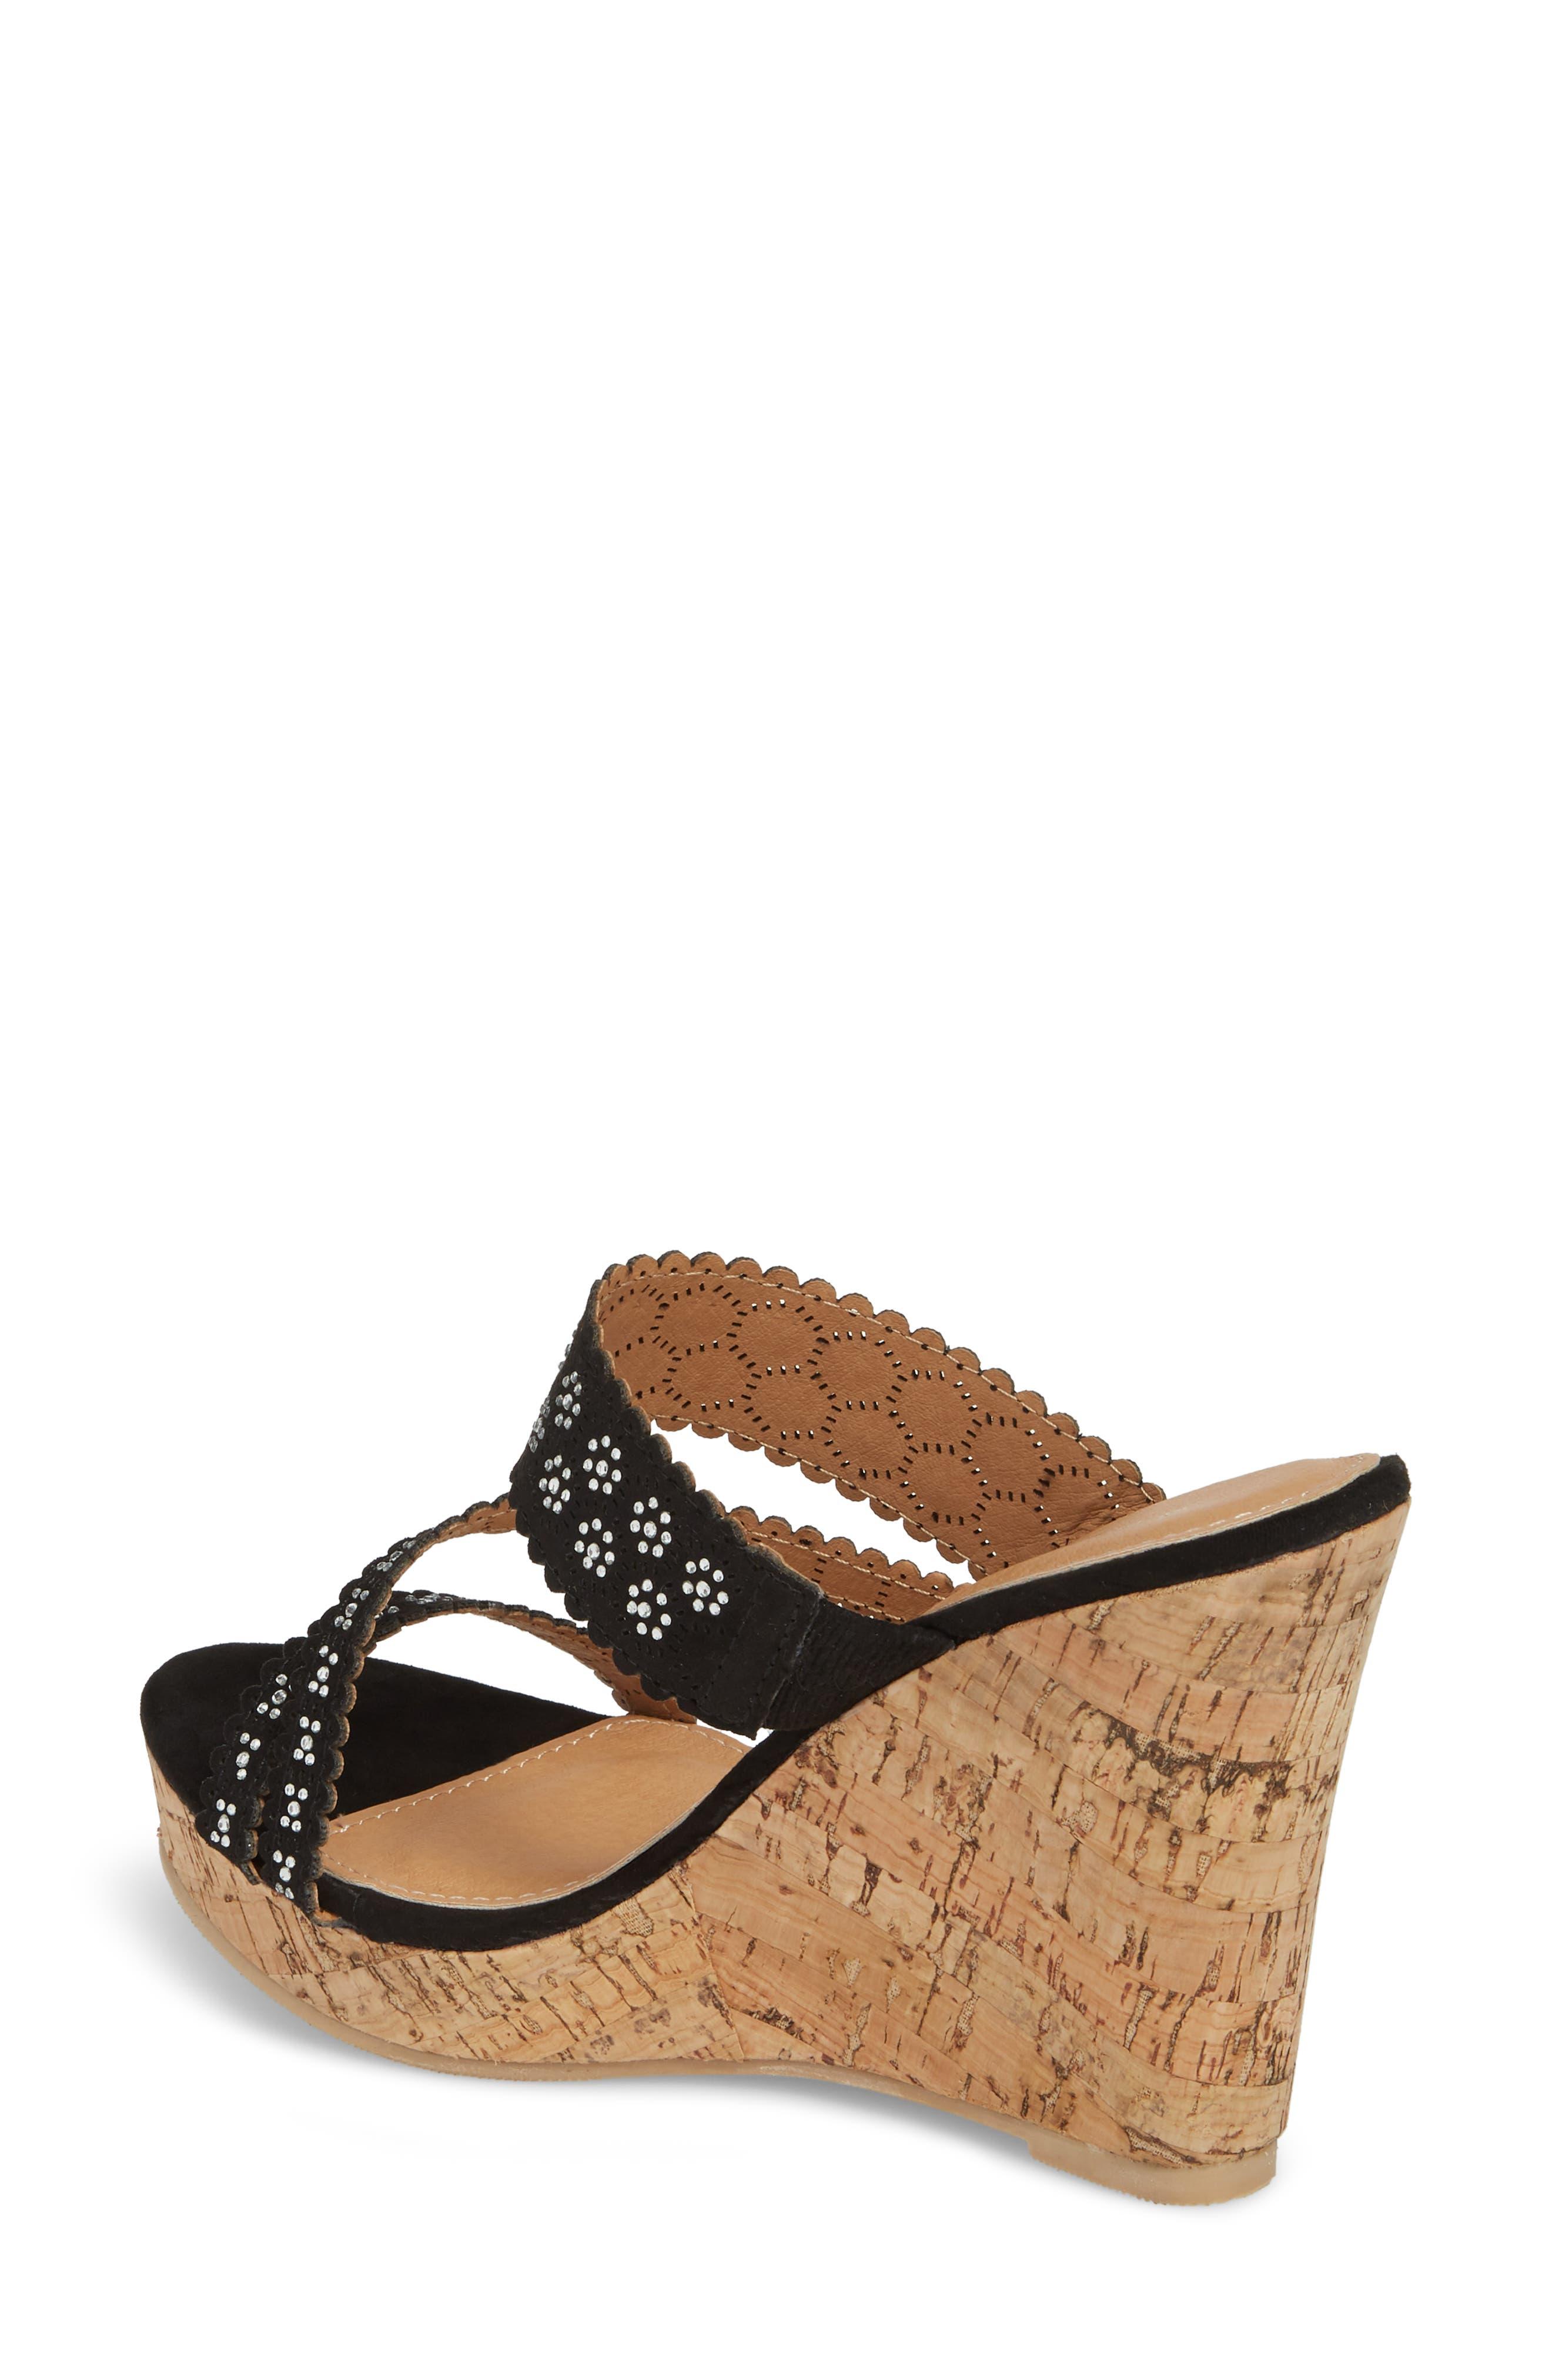 Alternate Image 2  - Athena Alexander Aerin Embellished Wedge Sandal (Women)